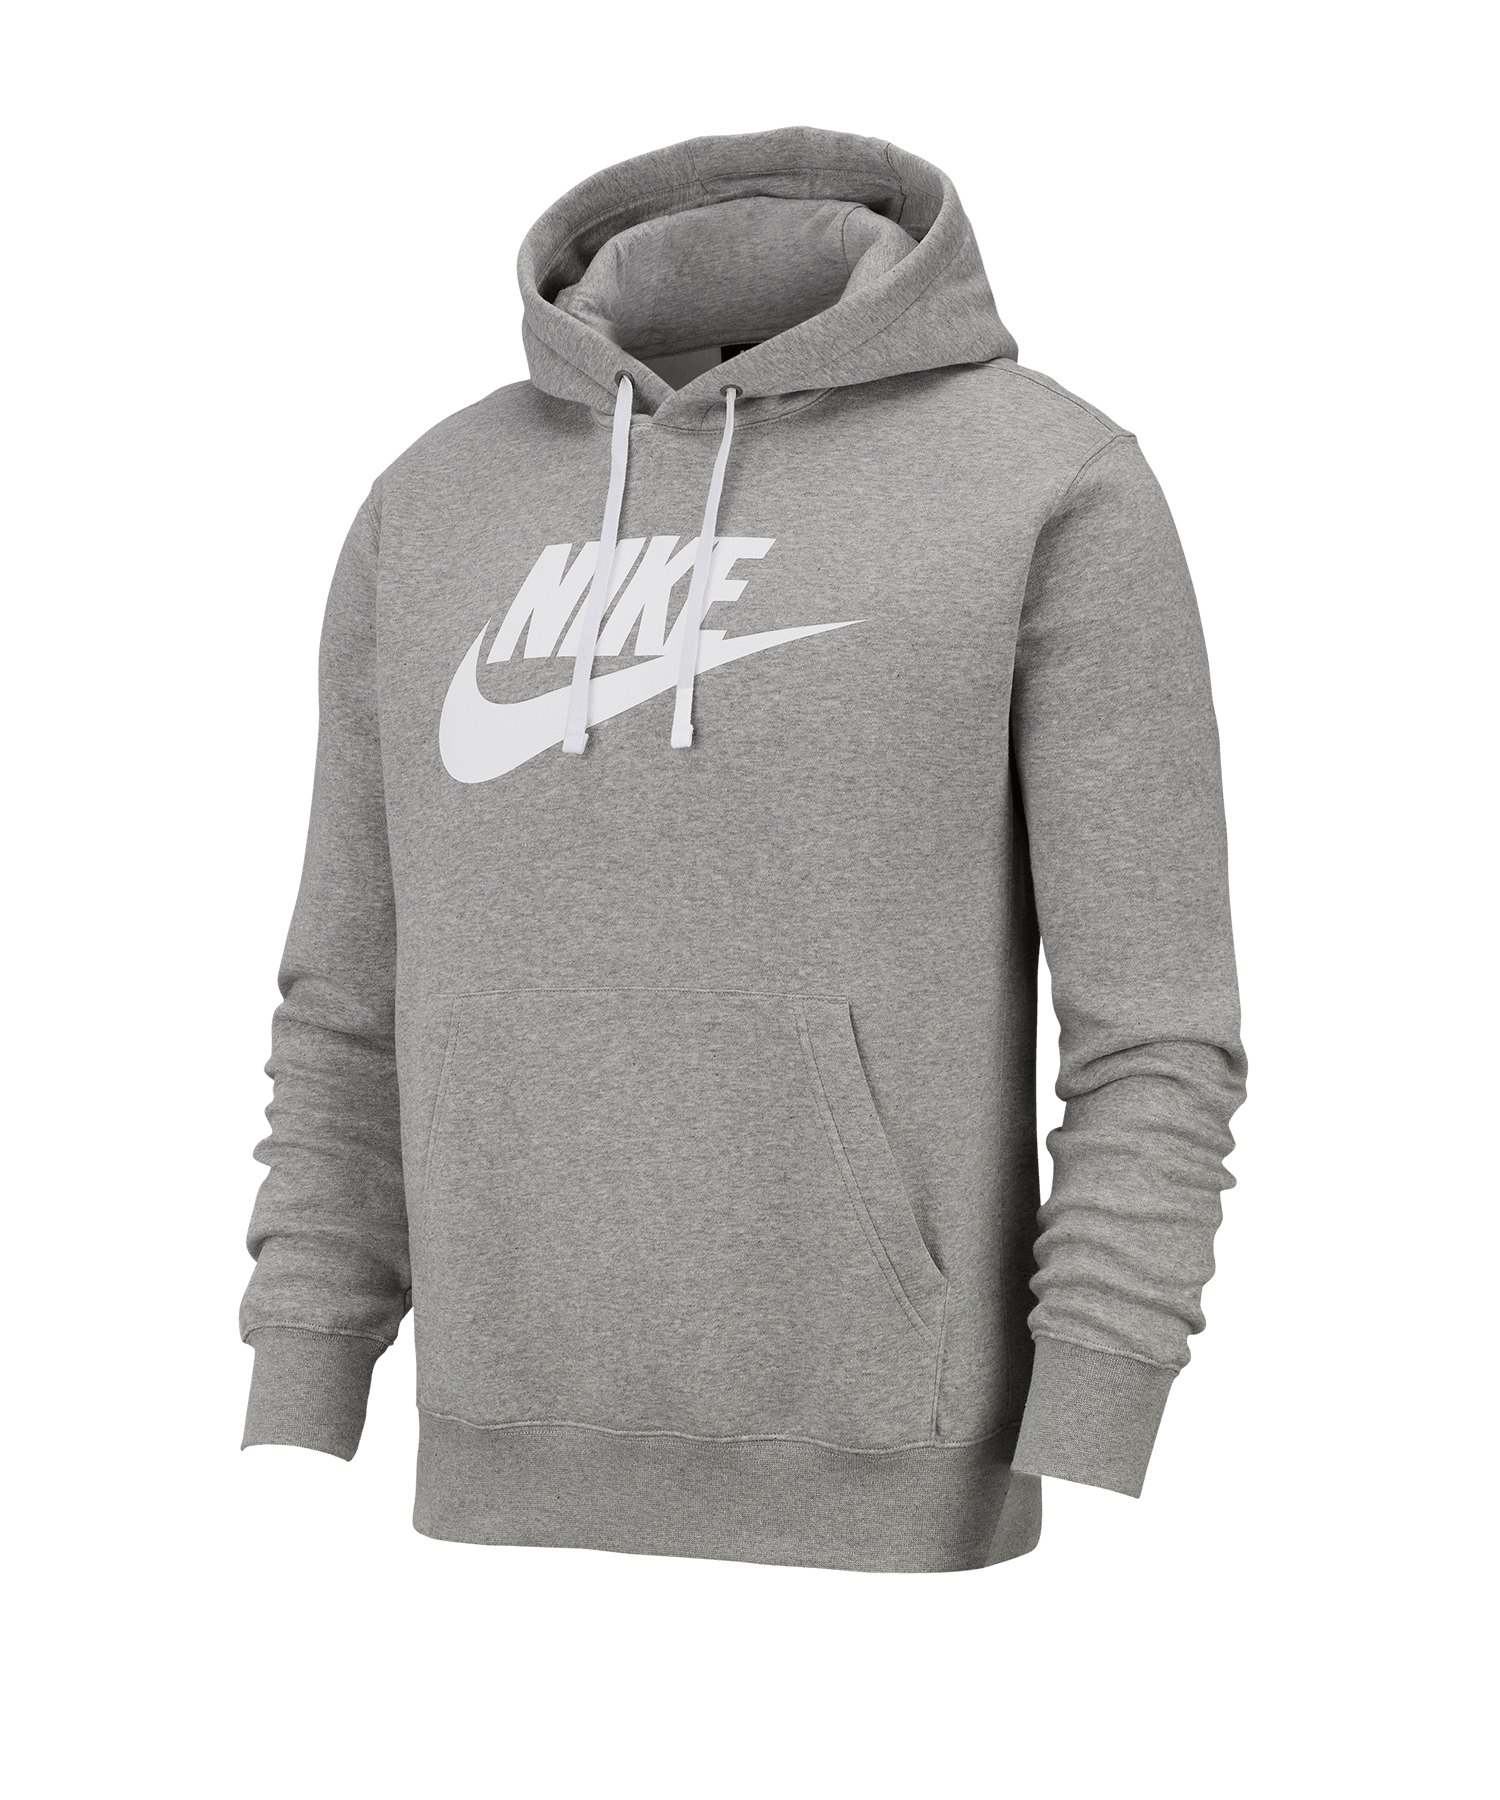 Nike Fleece Kapuzensweatshirt Hoody Grau F063 - grau